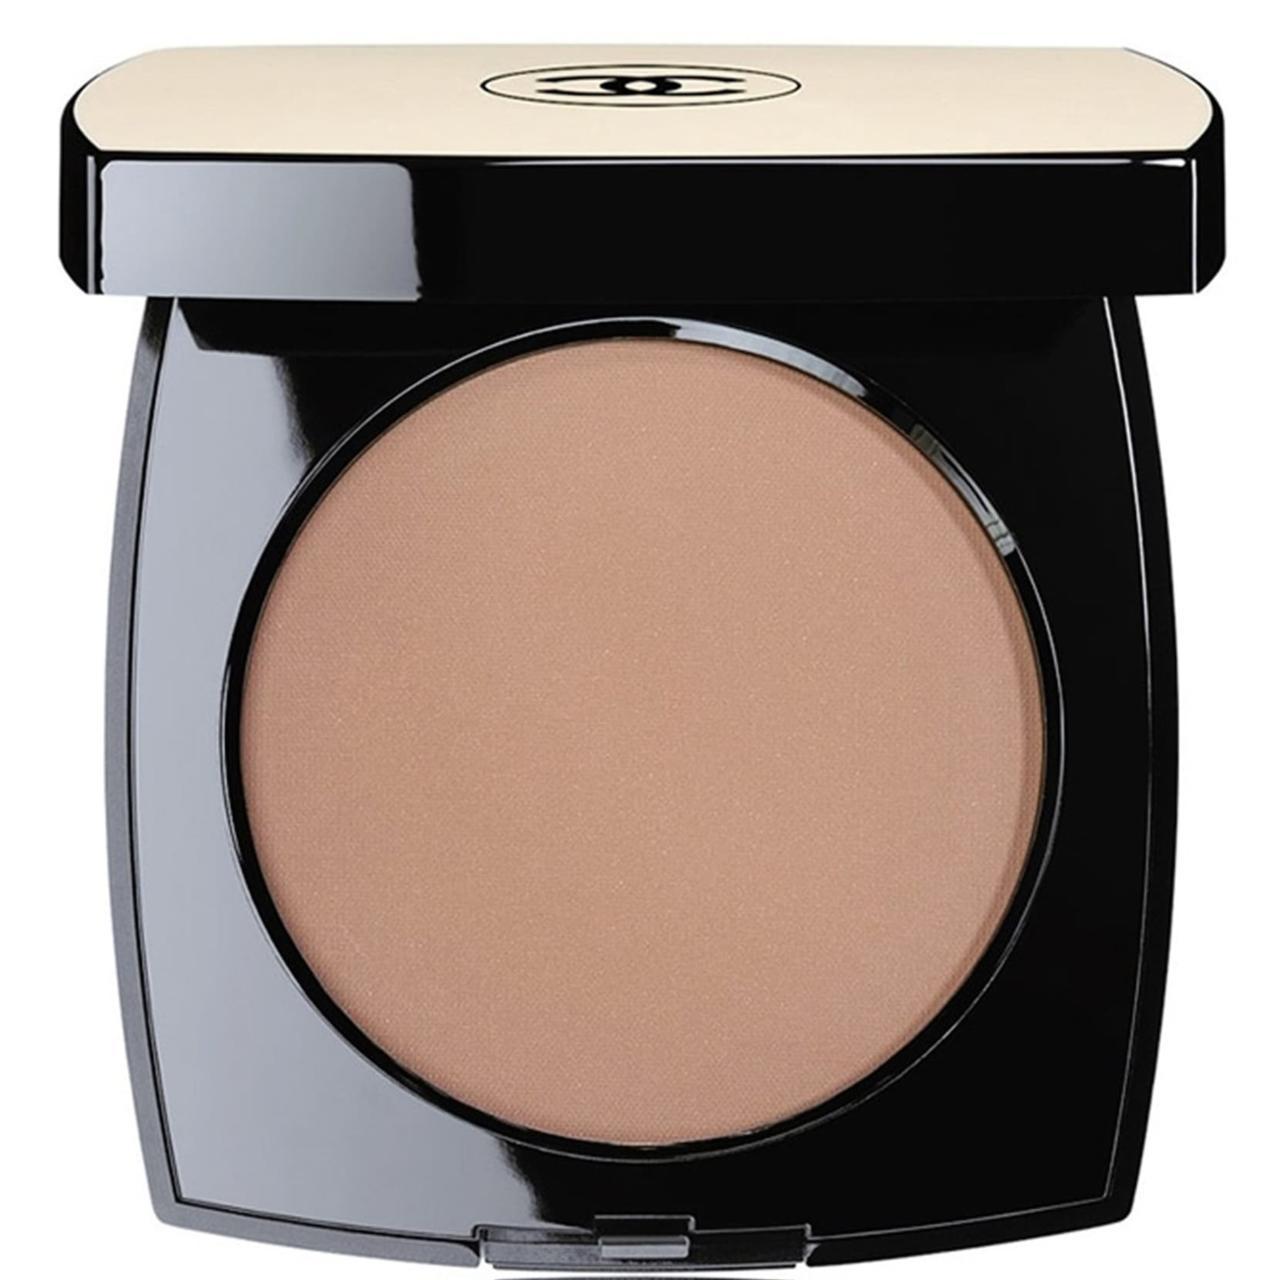 Chanel Les Beiges Healthy Glow Sheer Powder (50).